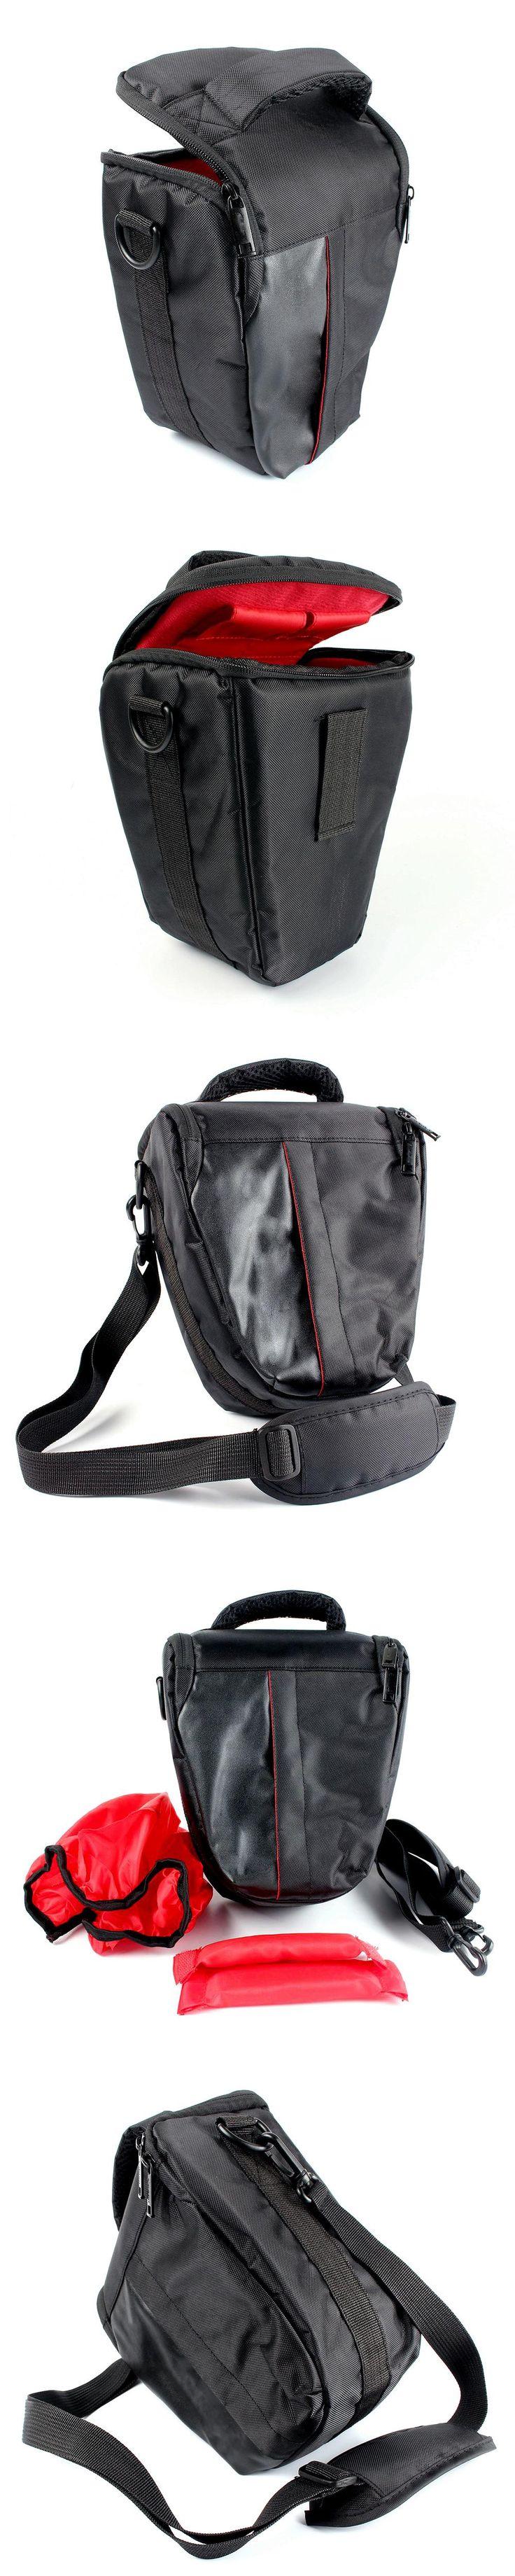 Waterproof Camera Case Shoulder Bag for Canon EOS 1300D 1200D 1100D 1000D 800D 760D 750D 700D 650D 600D 550D 500D 450D 200D 100D